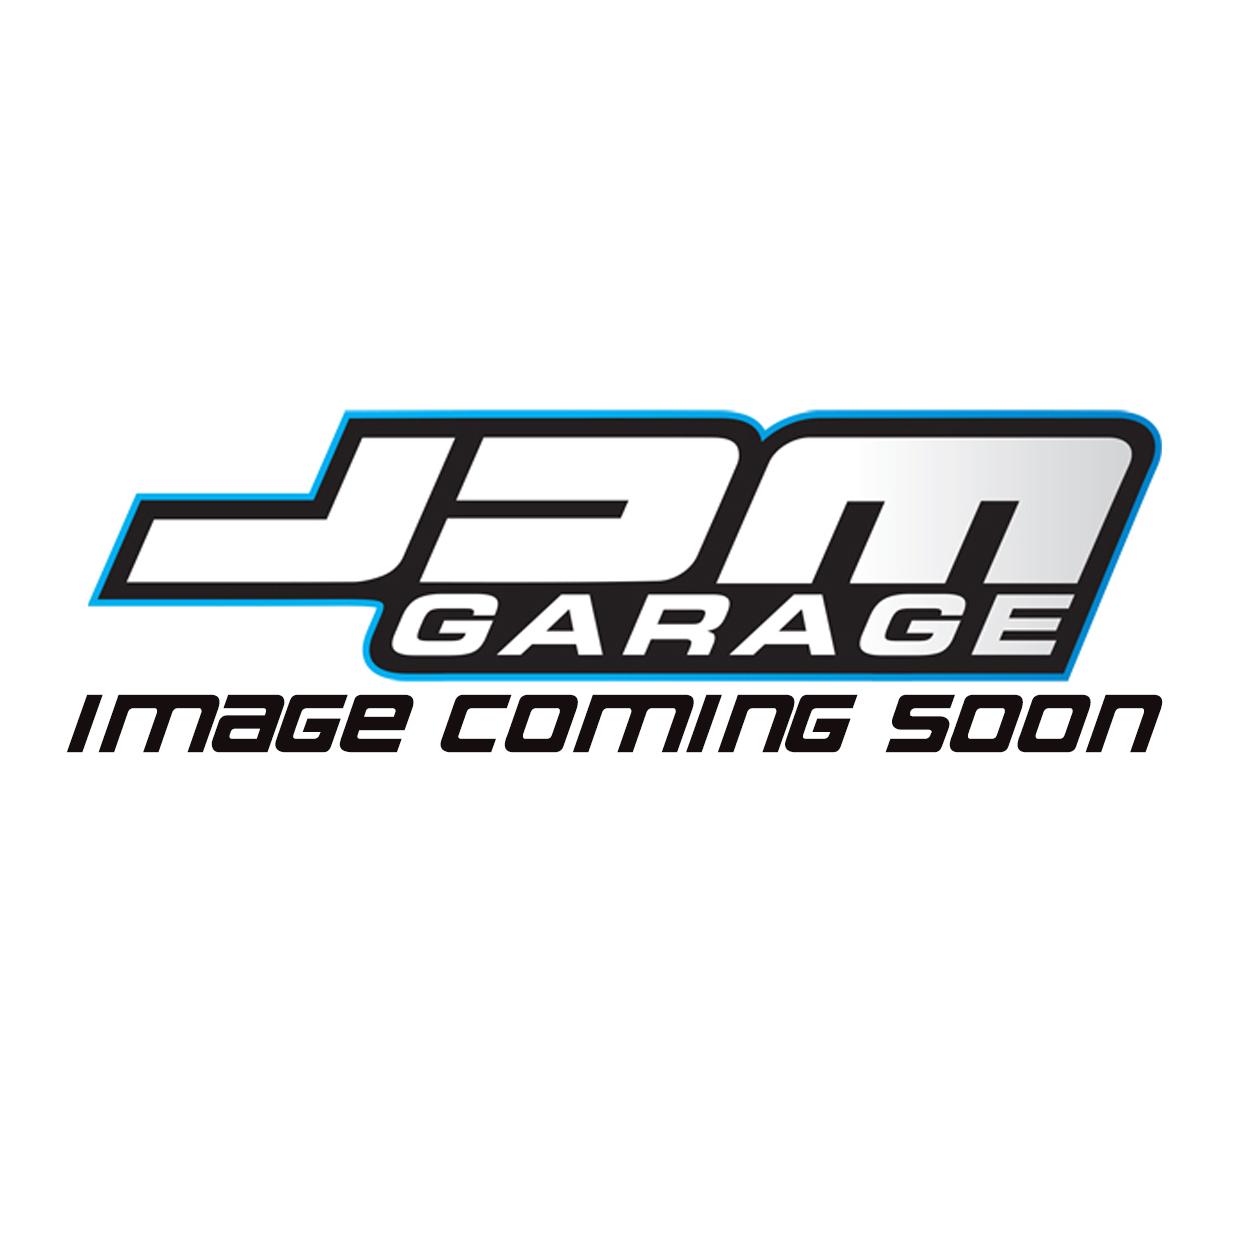 Radium Engineering BMW E46 M3 01-06 S54B32 Fuel Filter Kit w/ Stainless Filter 20-0429-03